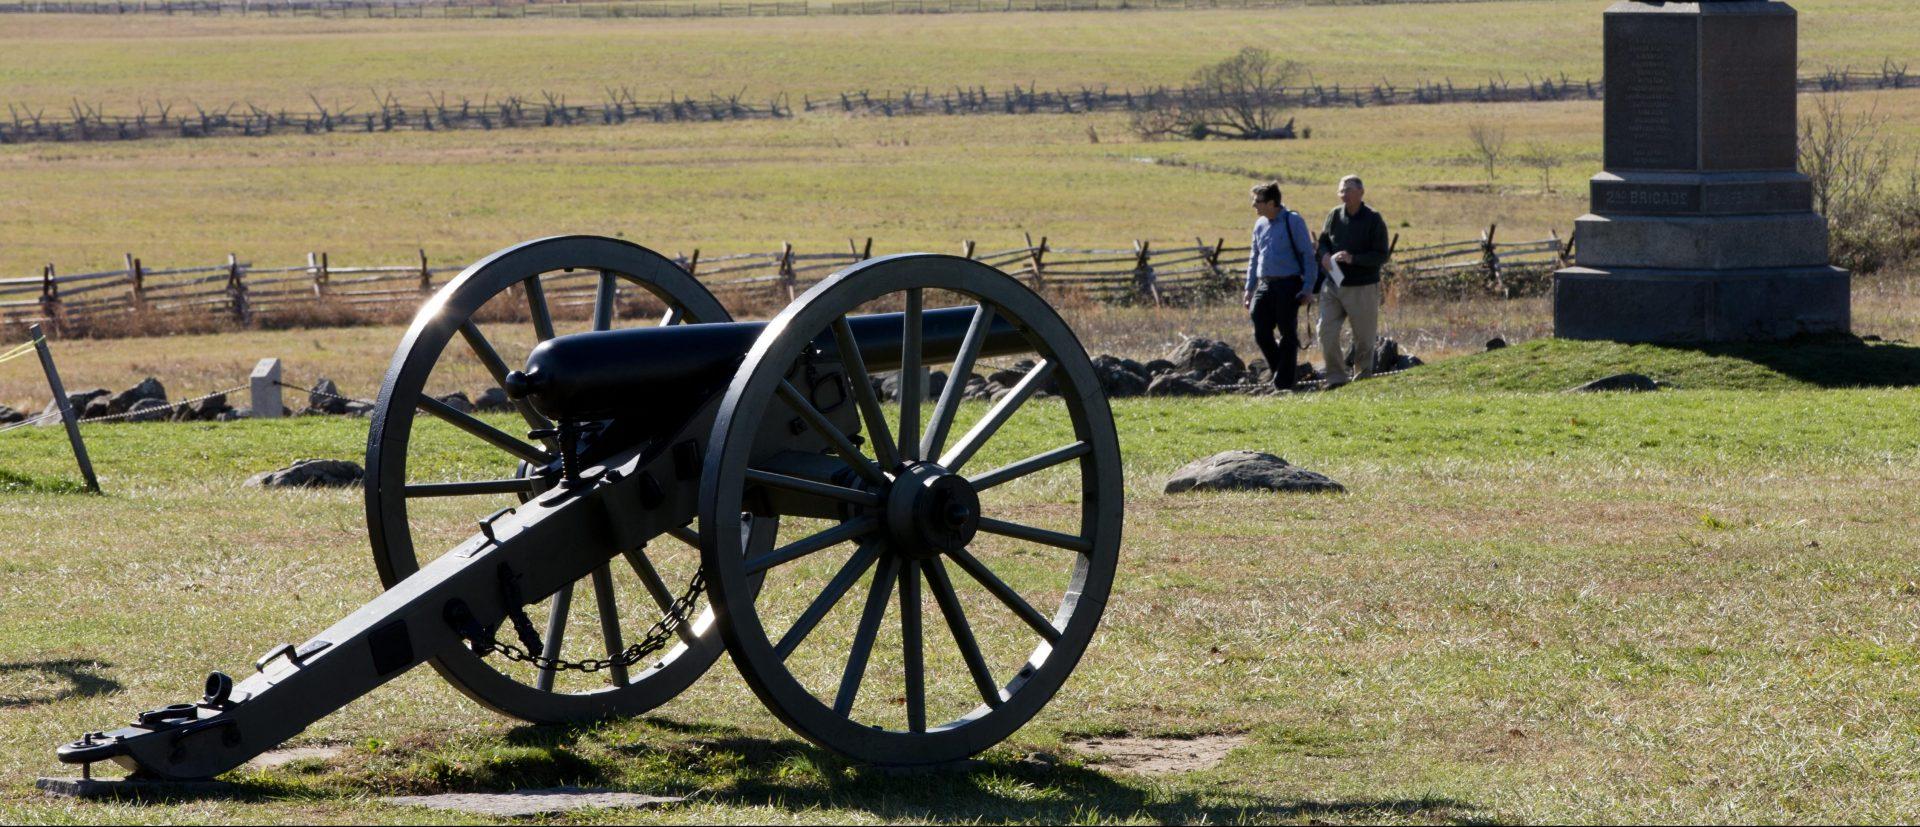 Civil War reenactment organization says no event in